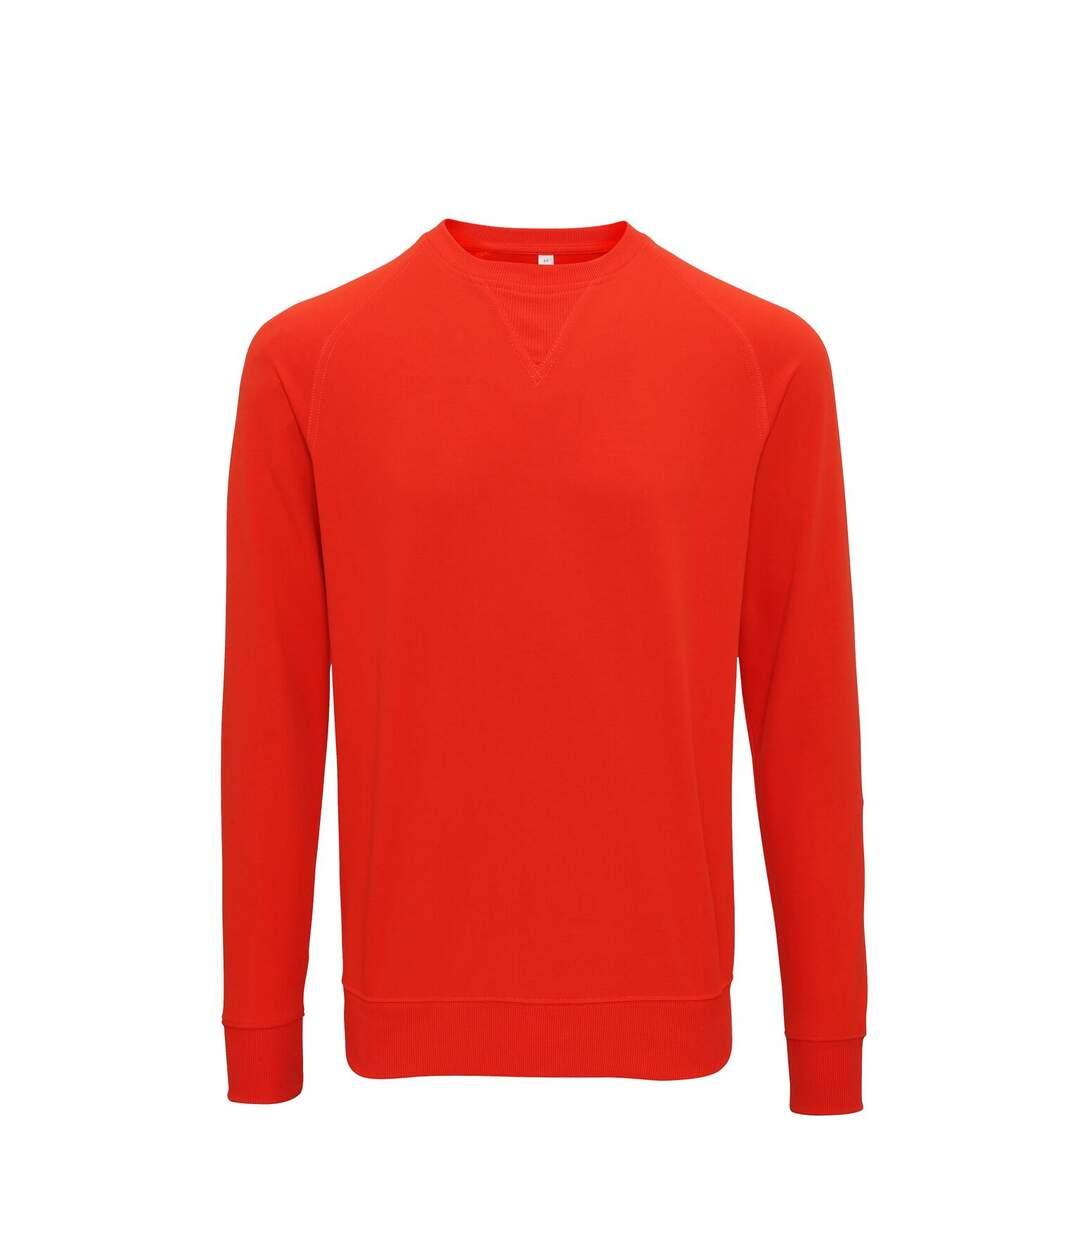 Asquith & Fox Mens Coastal Vintage Wash Loop Back Sweatshirt (Paprika) - UTRW6240